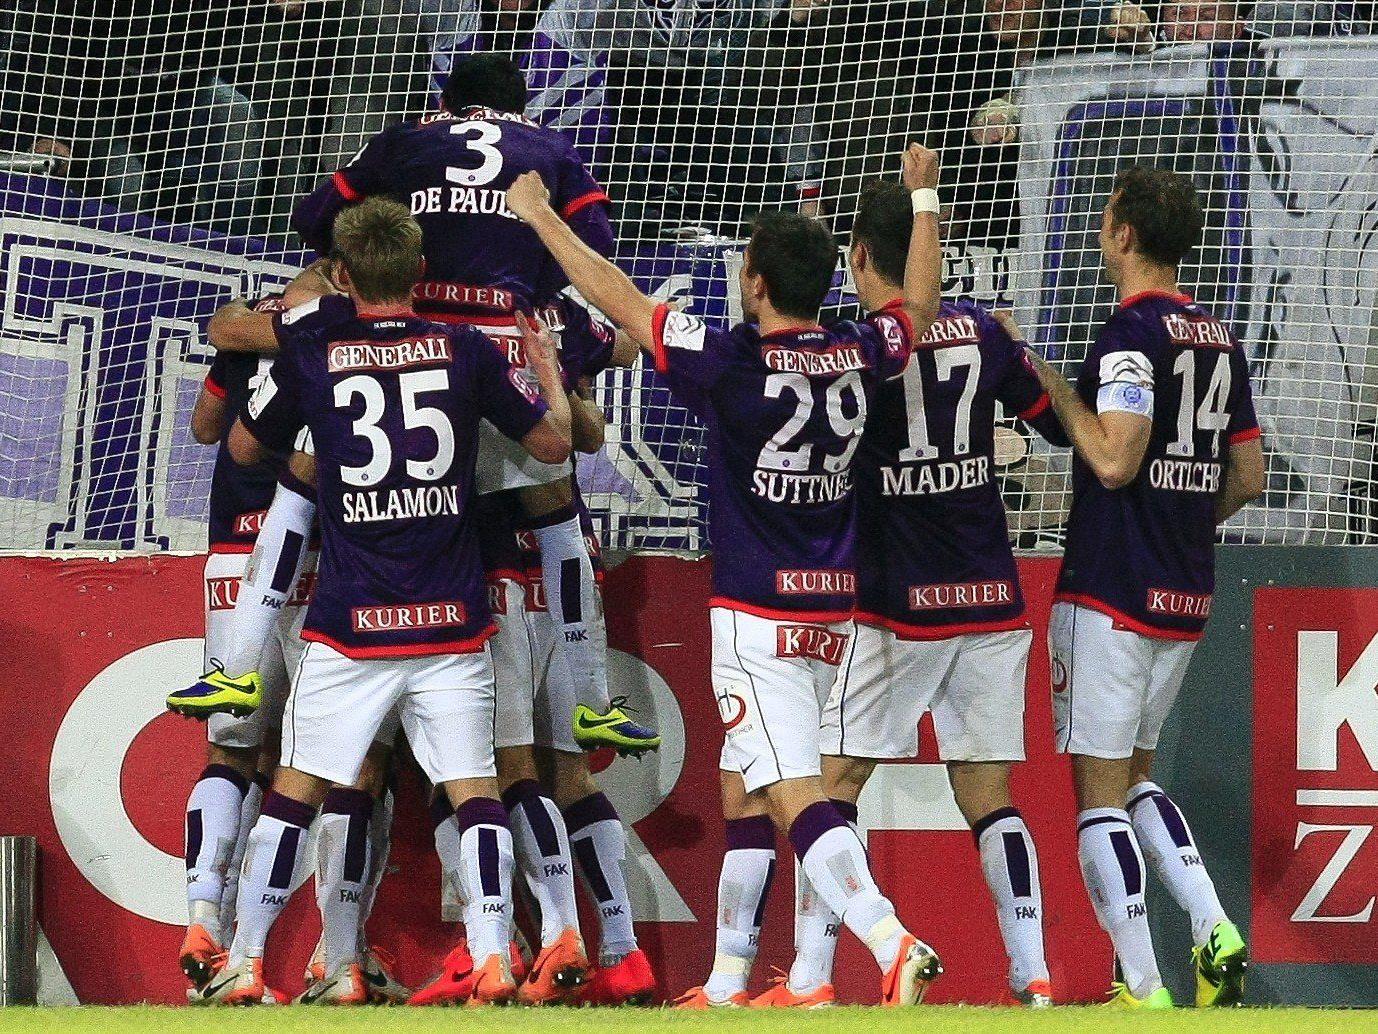 LIVE-Ticker zum Spiel FC Admira Wacker Mödling gegen FK Austria Wien.